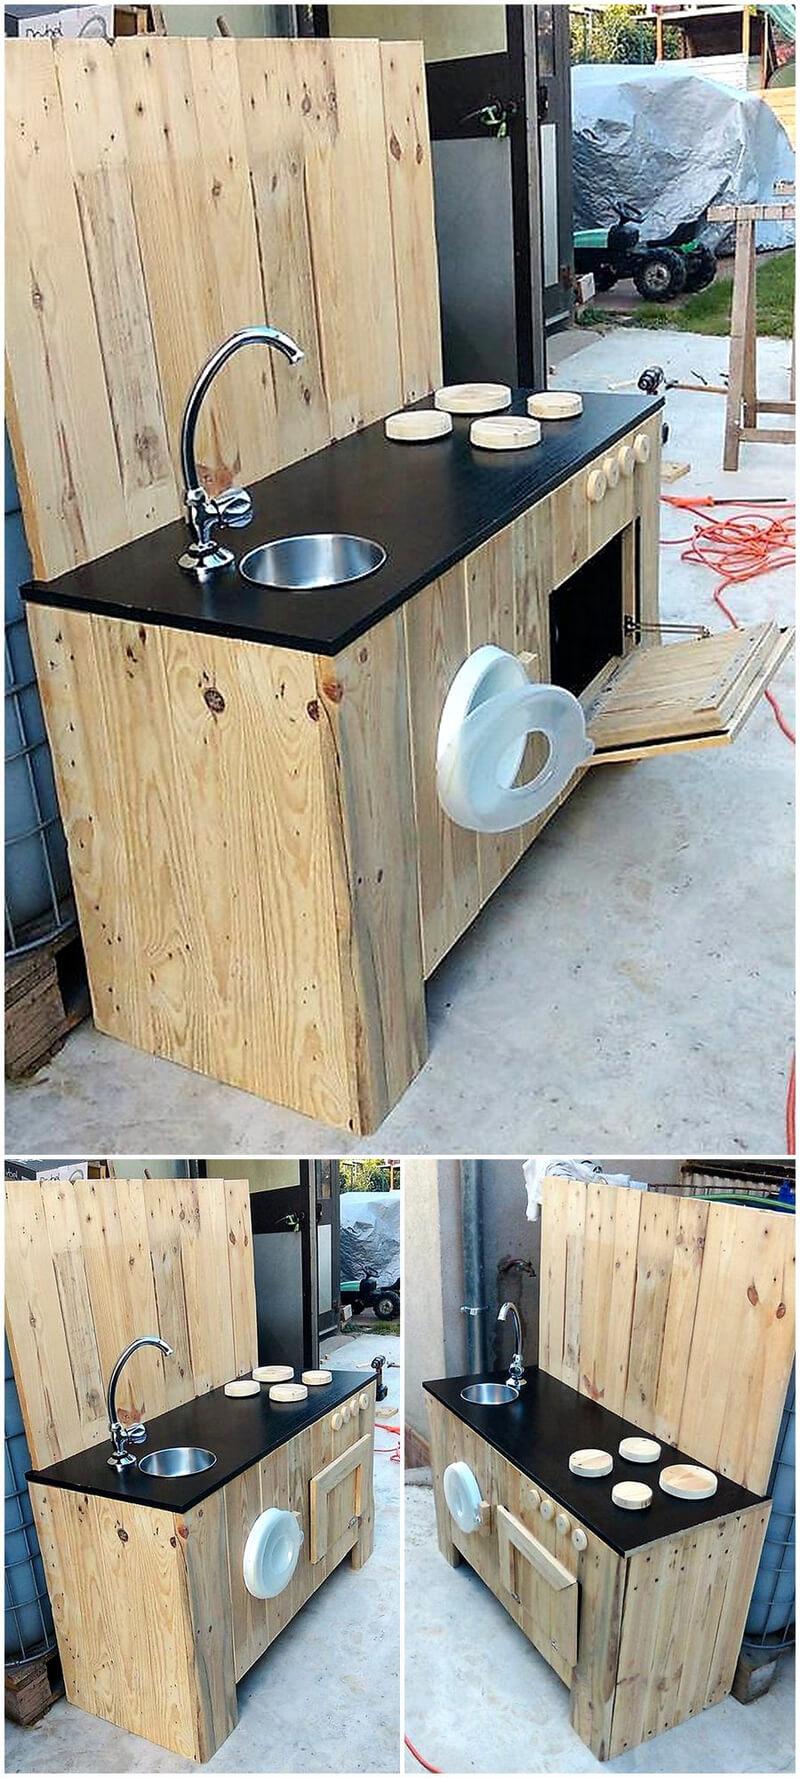 wood pallets mud kitchen for kids